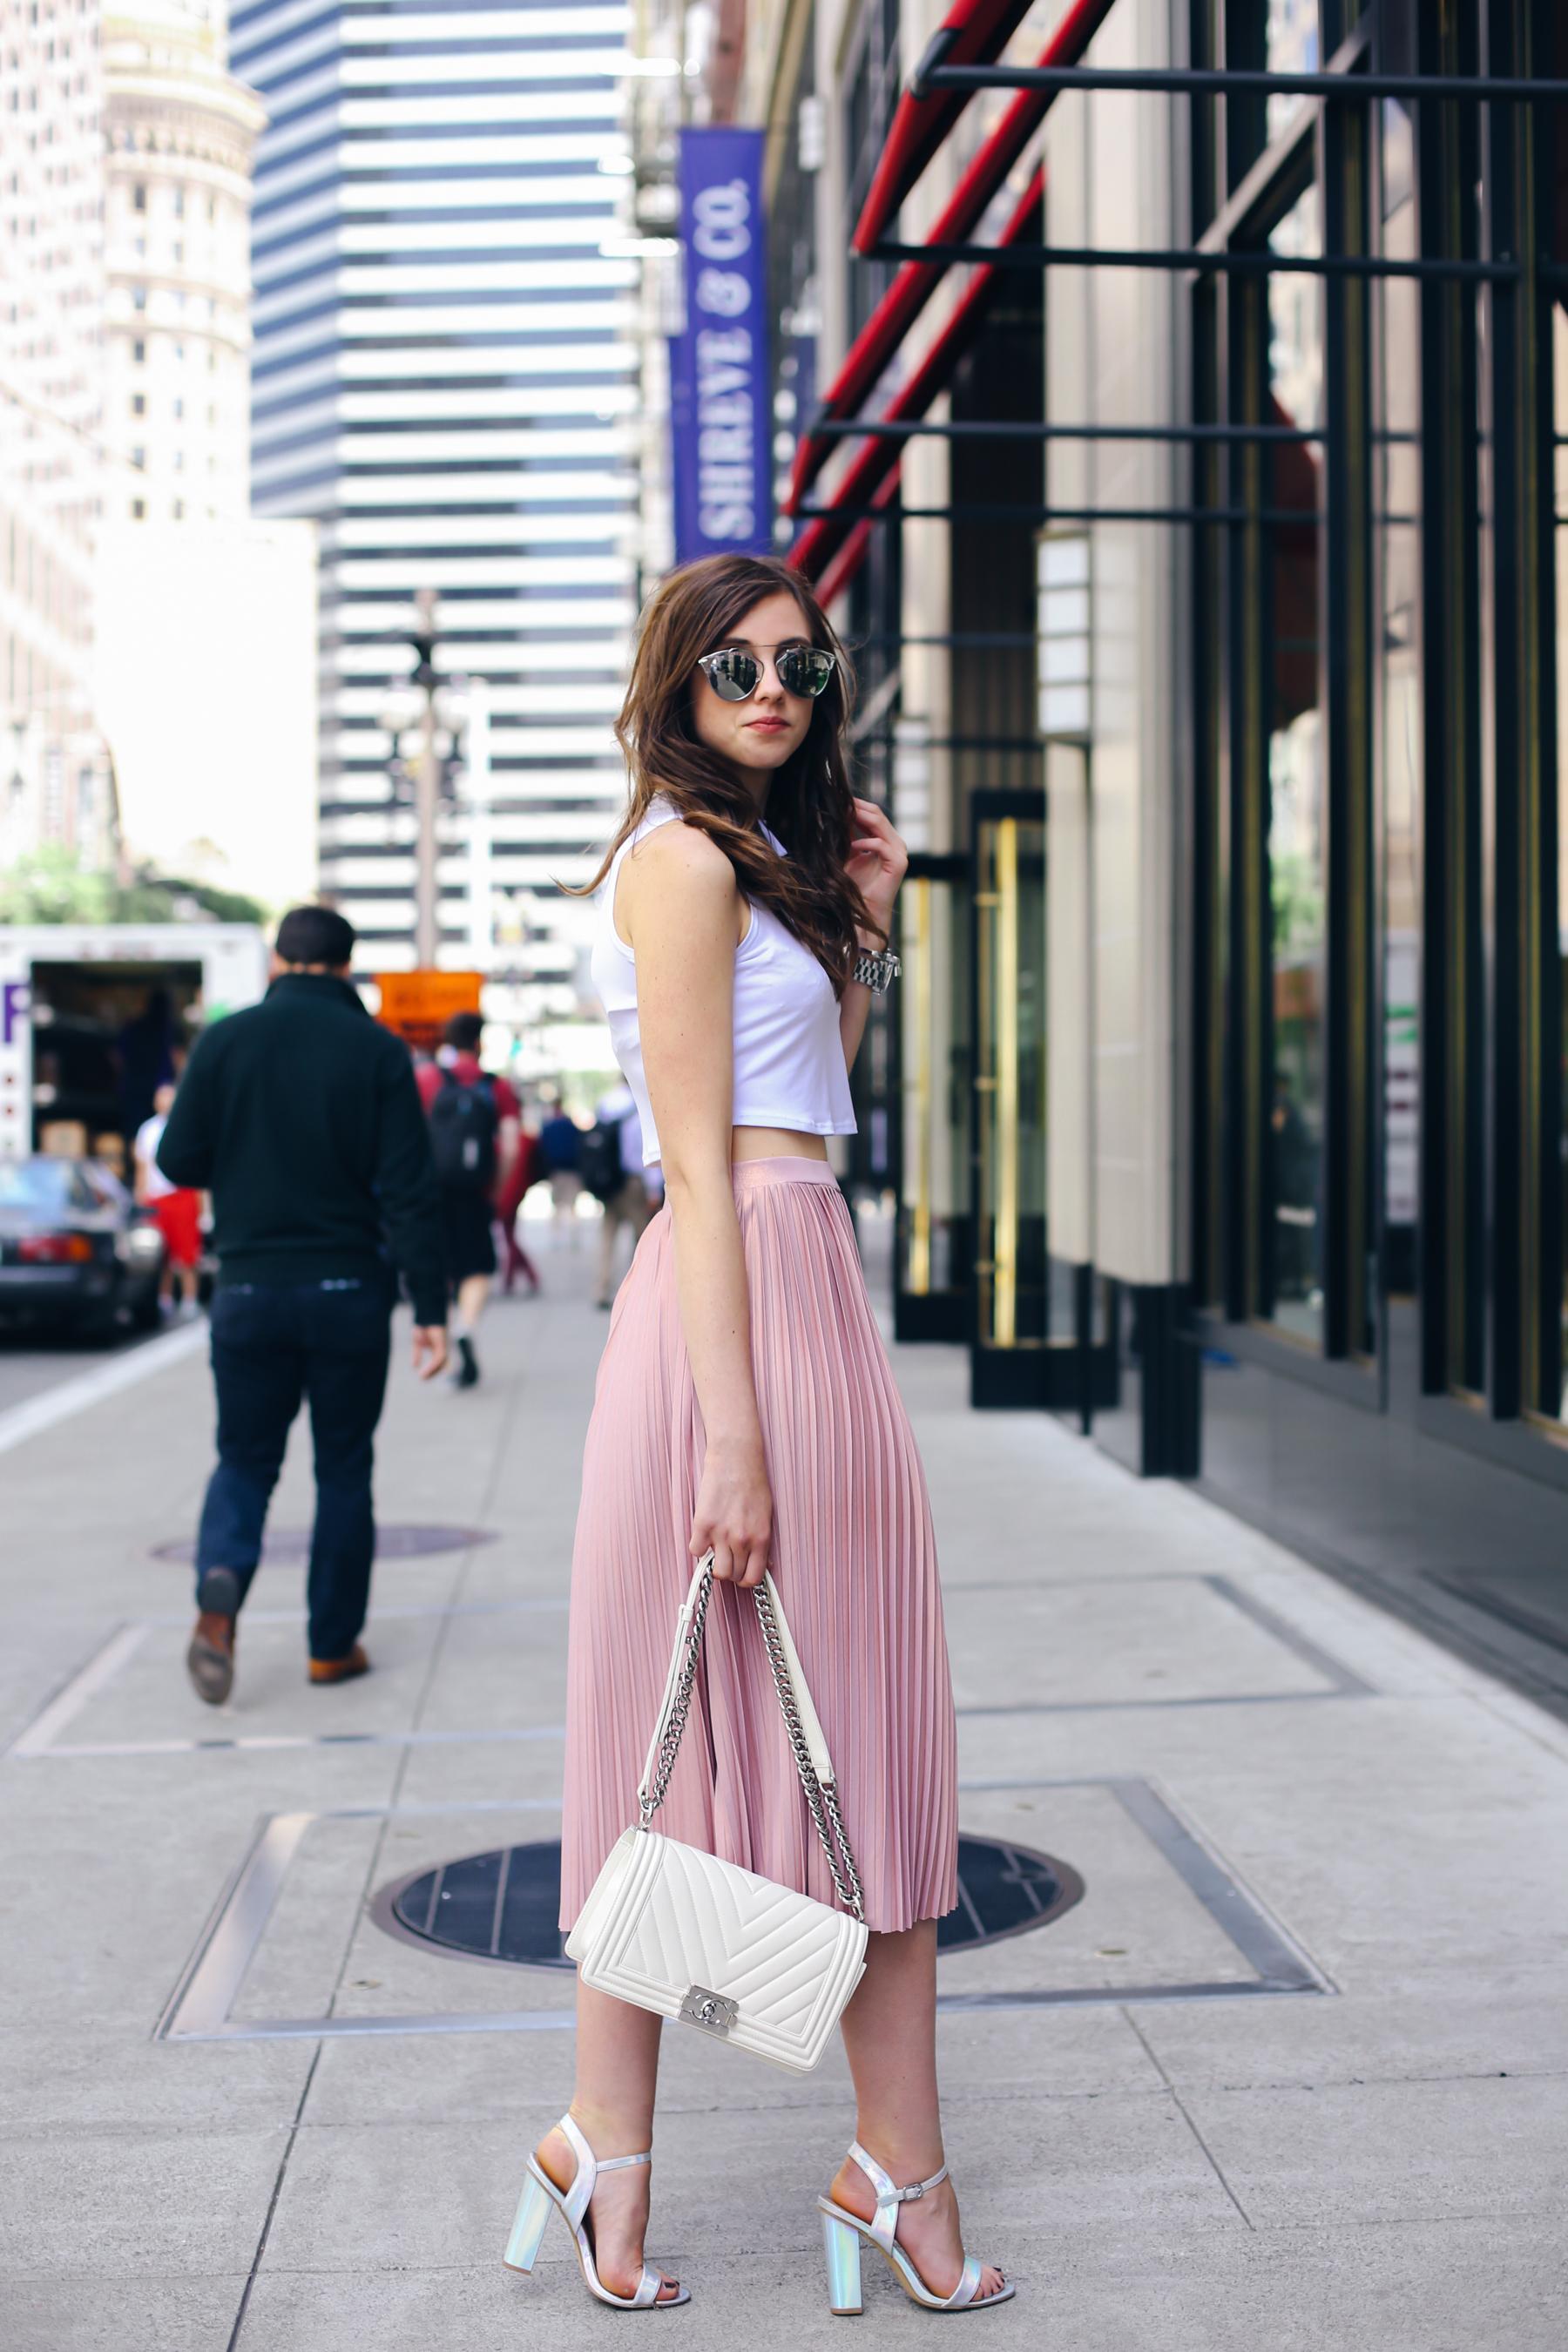 Barbora-Ondracova-FashioninmySoul-Fashion-Blogger-Photography-RyanbyRyanChua-7473